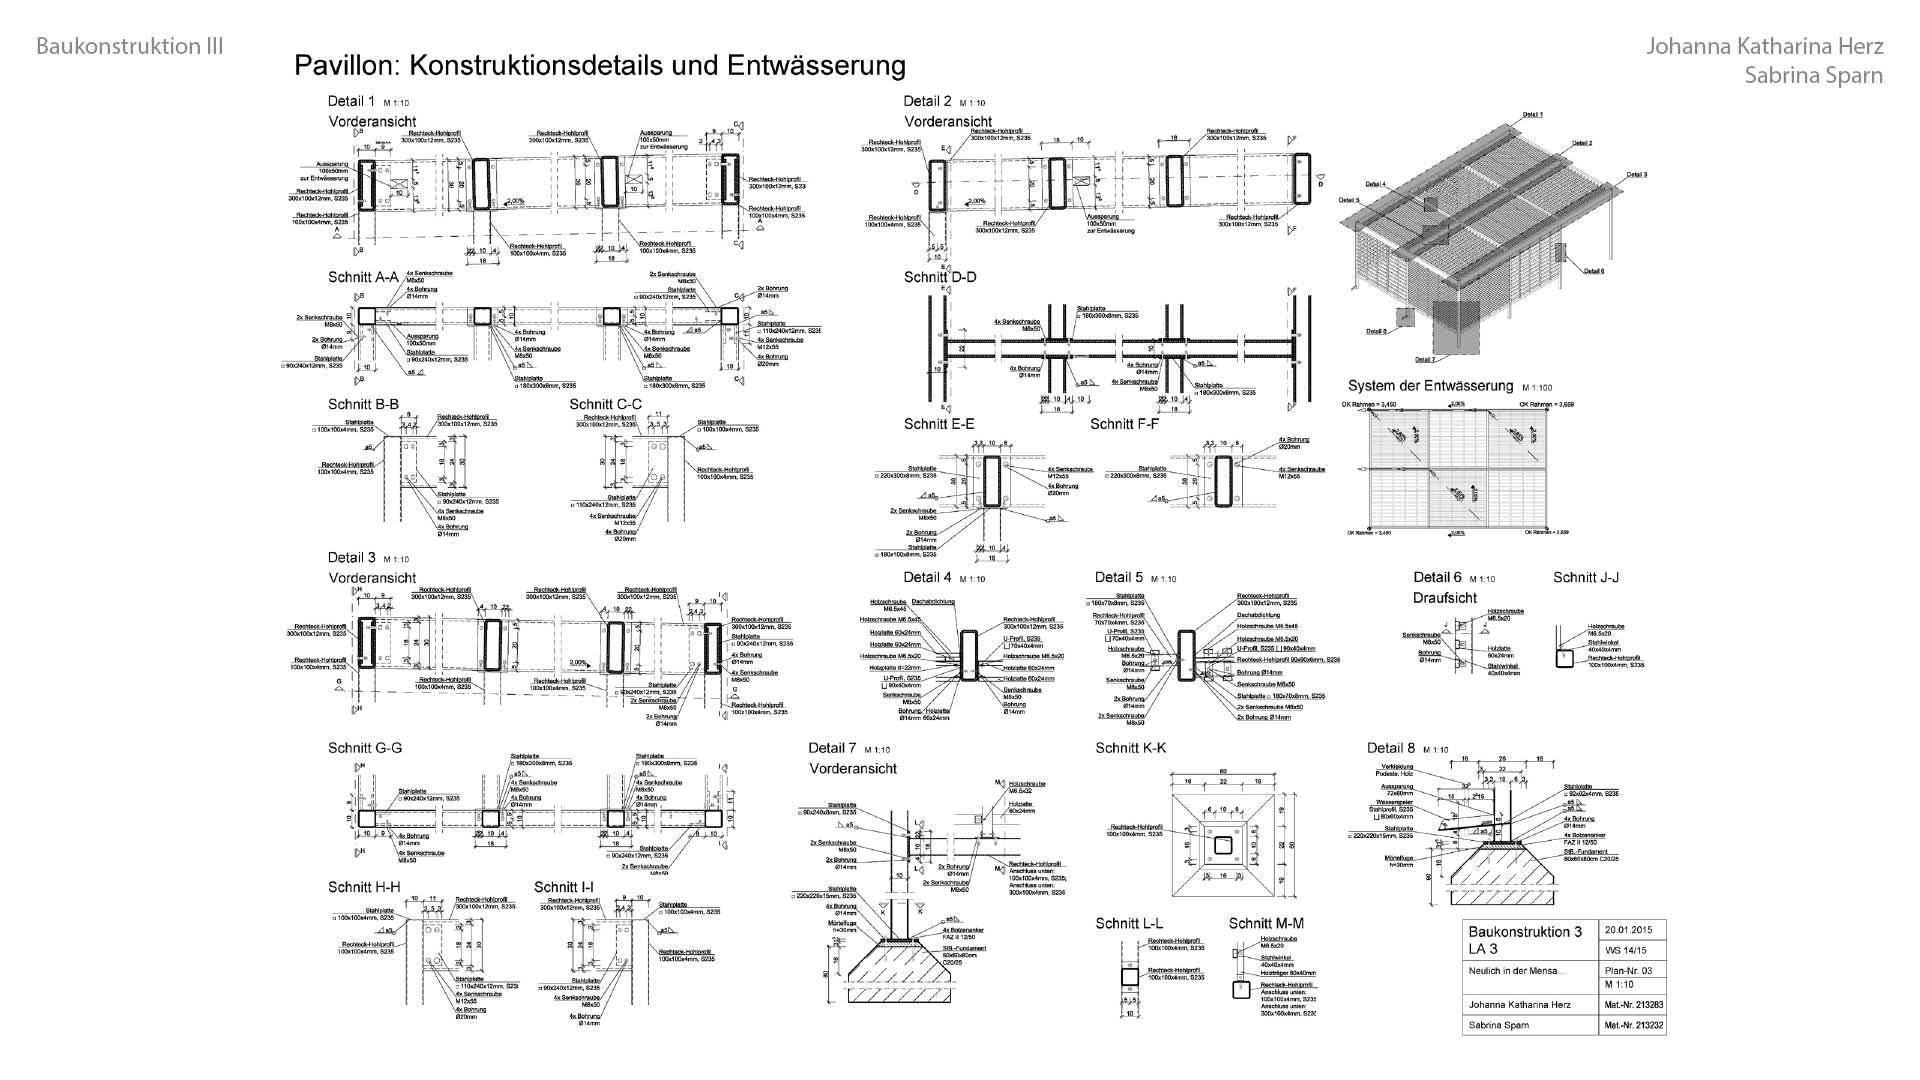 08 14 03 Baukonstruktion III